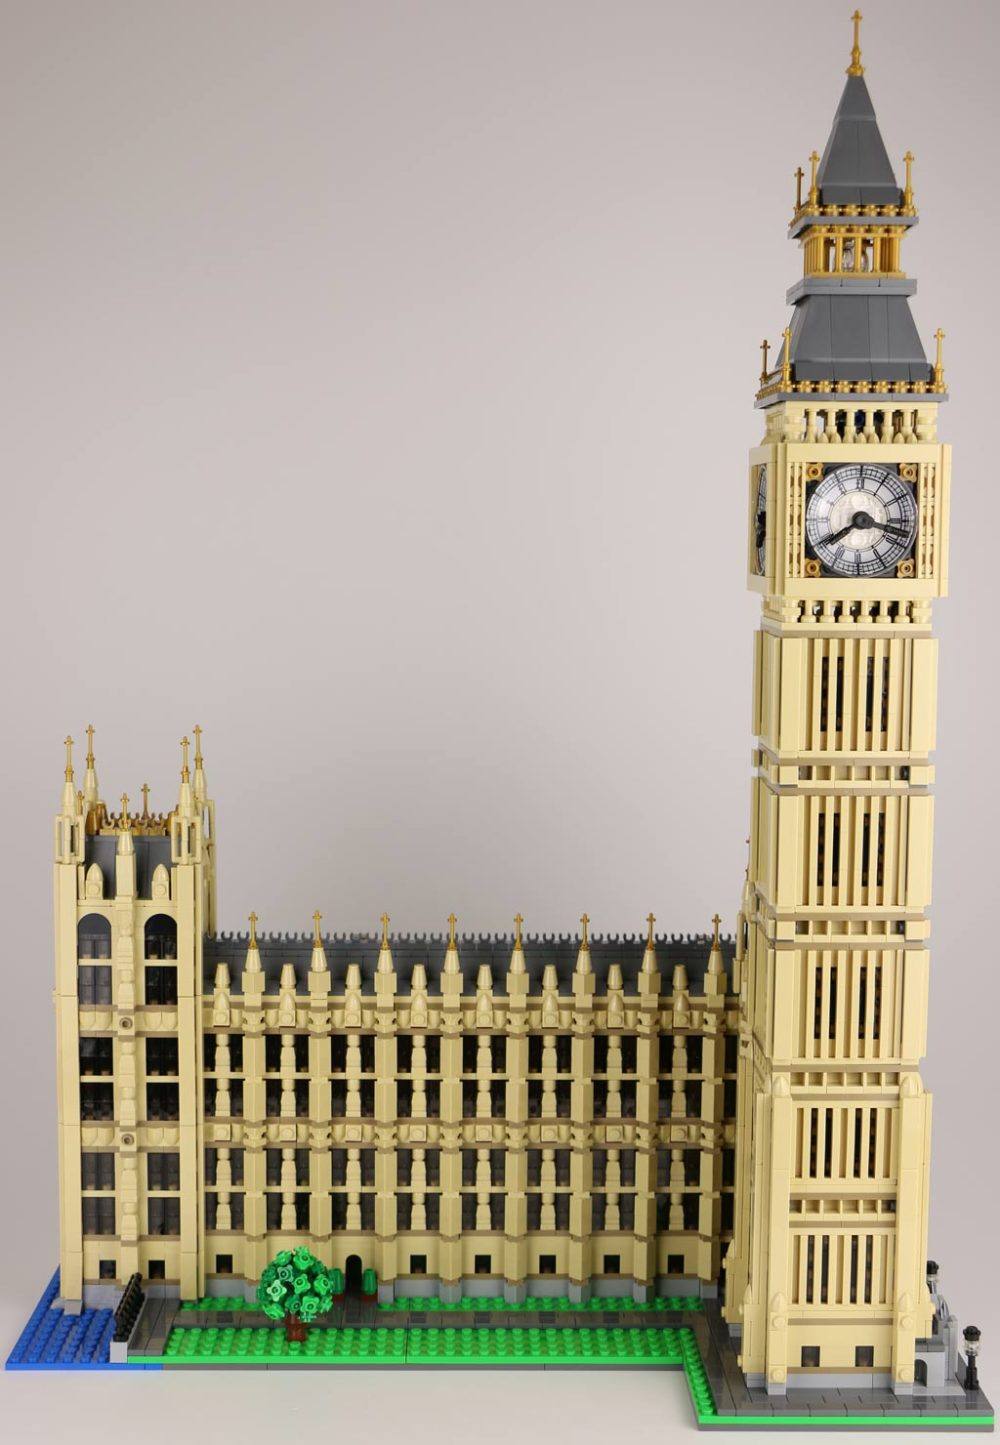 LEGO Creator Expert 10253 Big Be